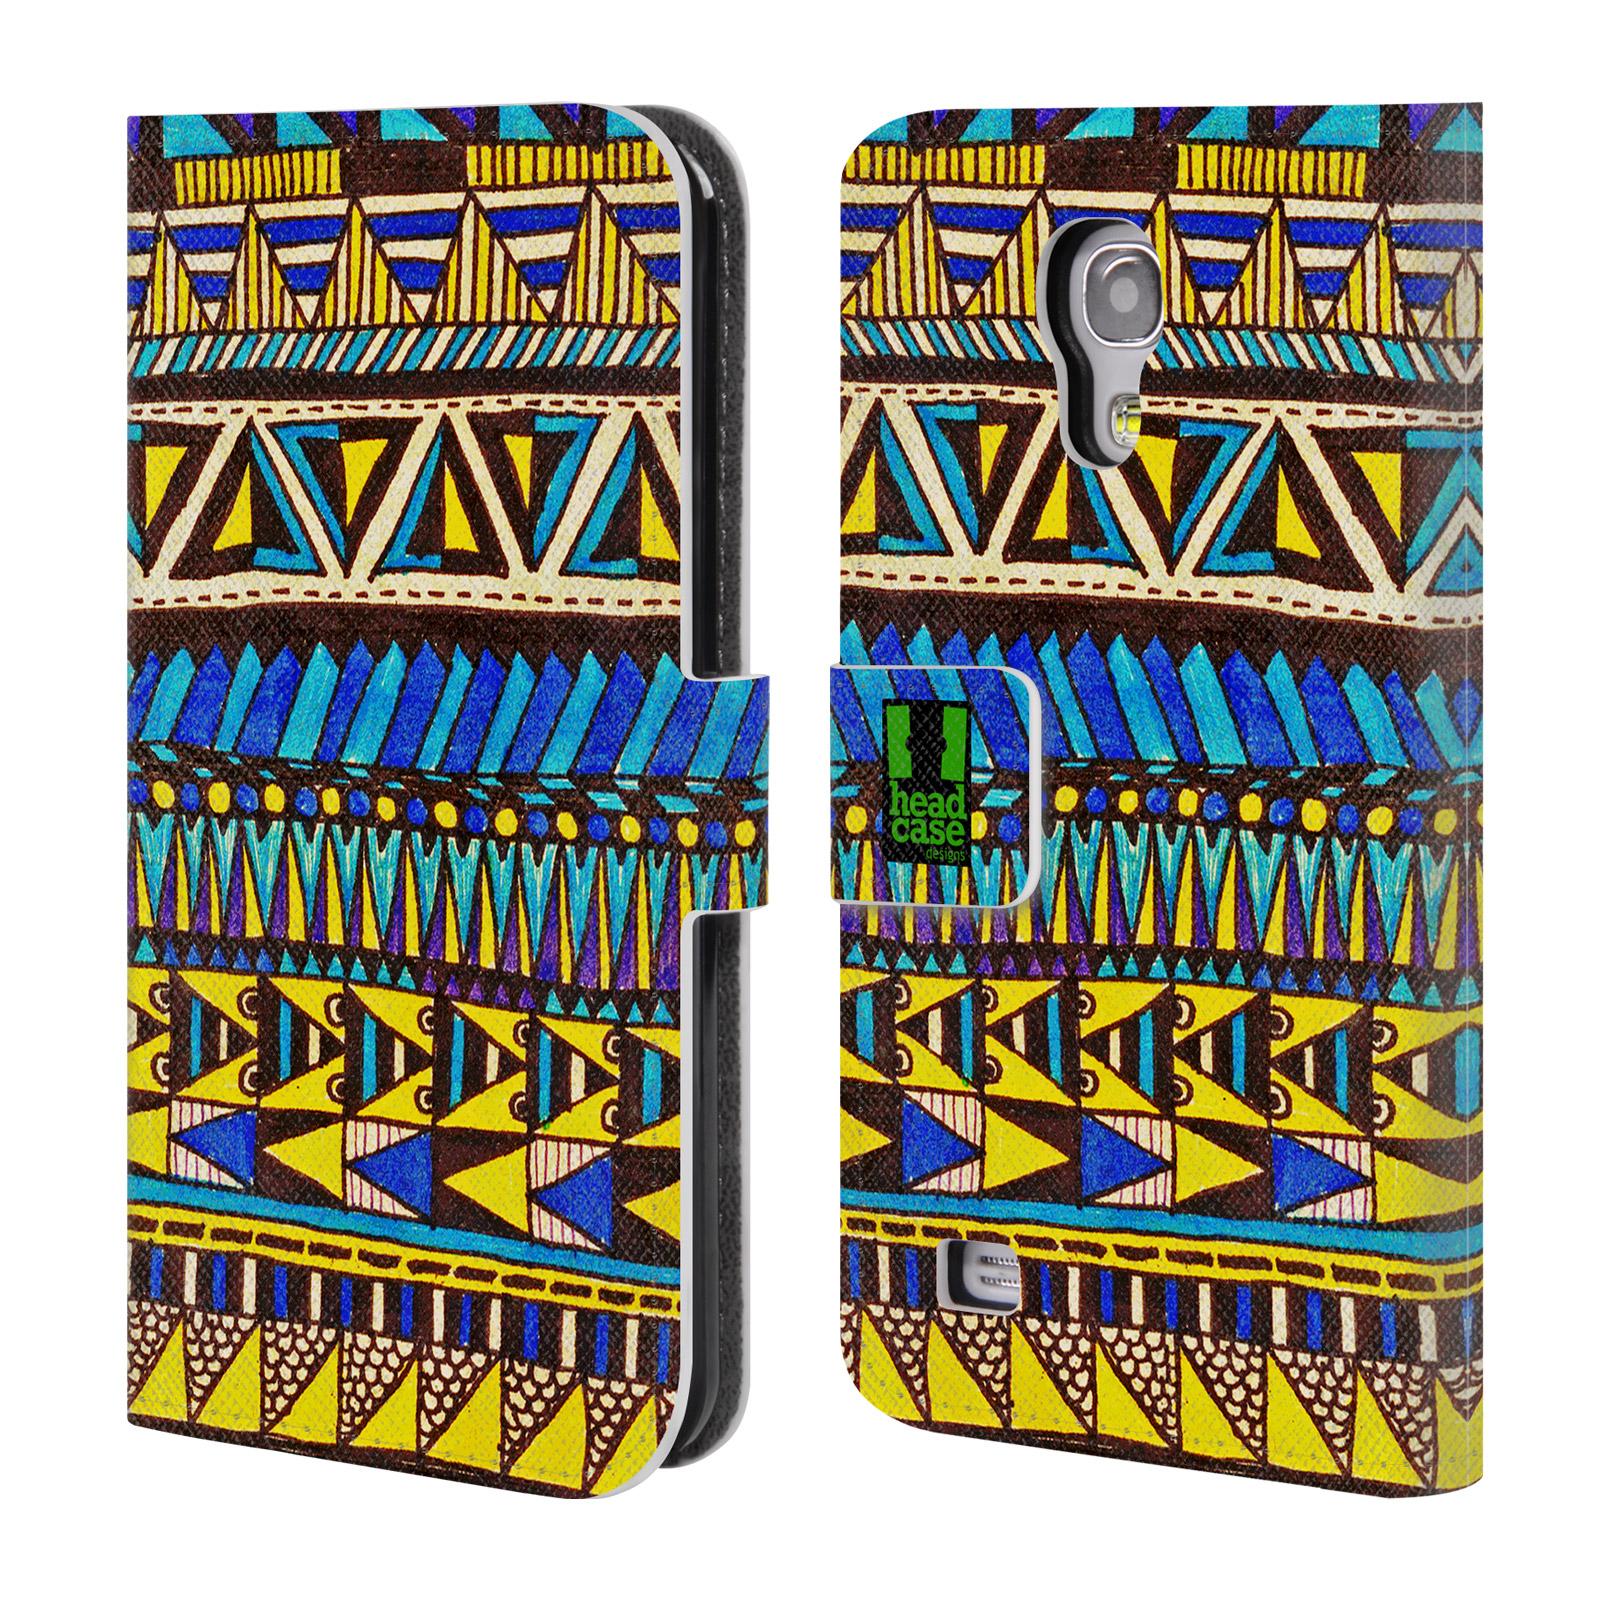 HEAD CASE Flipové pouzdro pro mobil Samsung Galaxy S4 MINI / S4 MINI DUOS Barevná aztécká čmáranice modrá